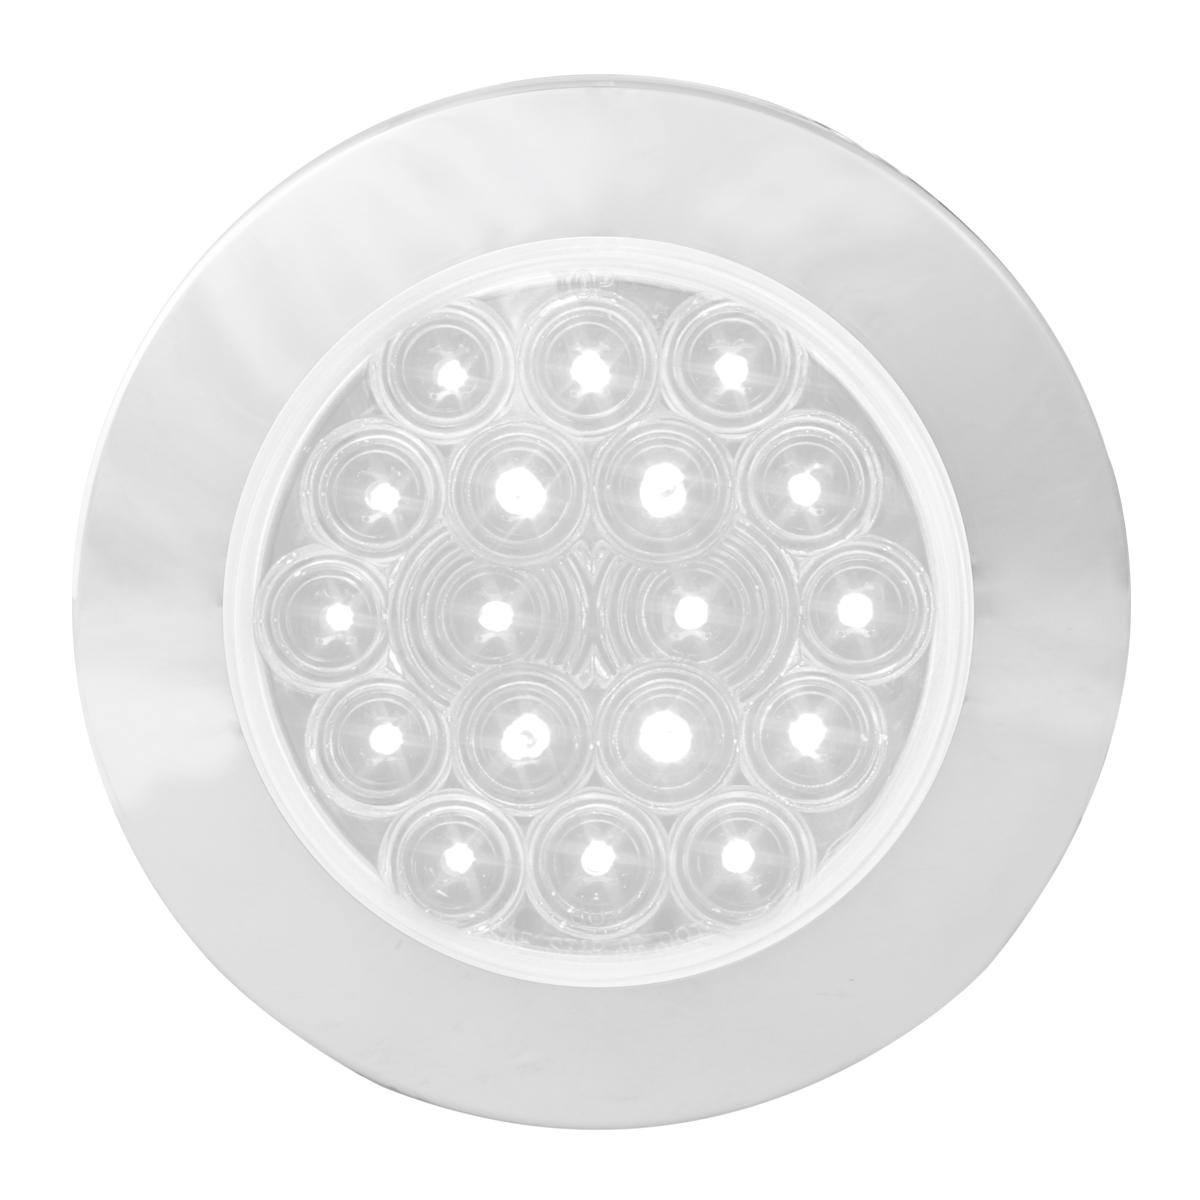 "75904 White/Clear 4"" Fleet Flange Mount LED Light with Chrome Twist & Lock Bezel"